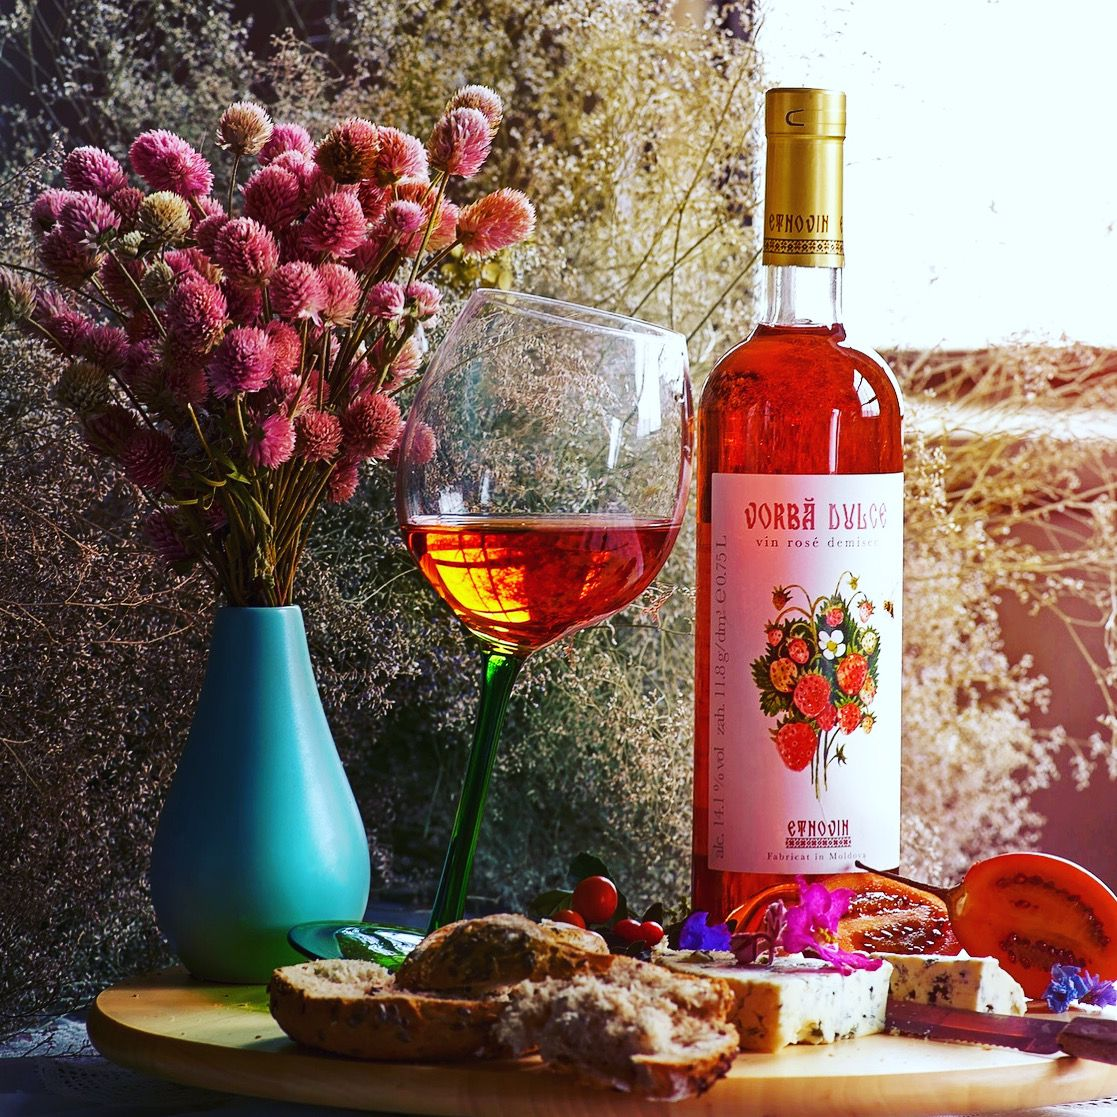 Rose Wine From Moldova In 2020 Rose Wine Wine Bottle Dry Rose Wine